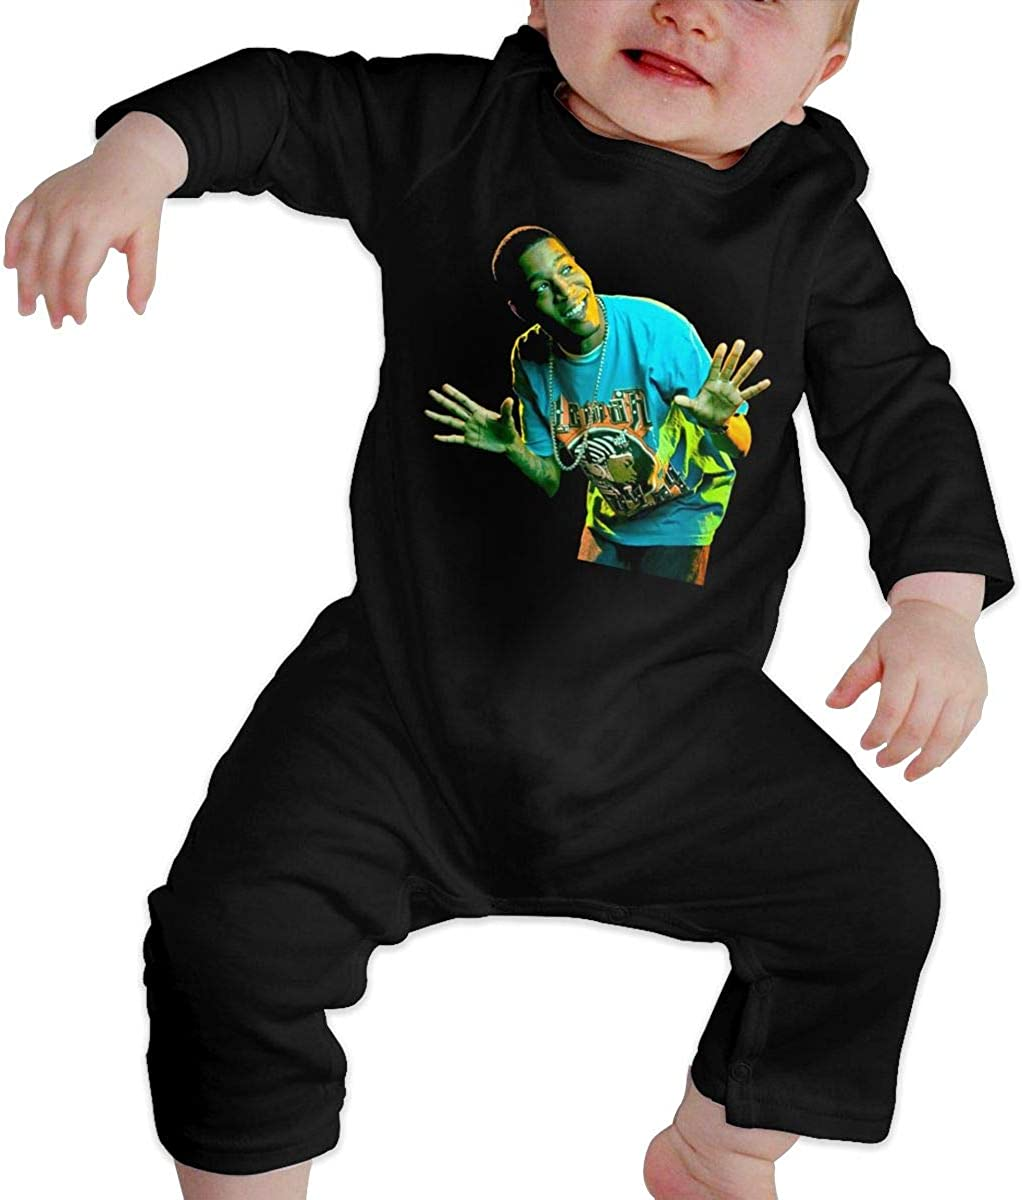 Qq1-asd-store Kid Cudi Boys//Girls Baby Cotton Long Sleeve Romper Warm Bodysuit